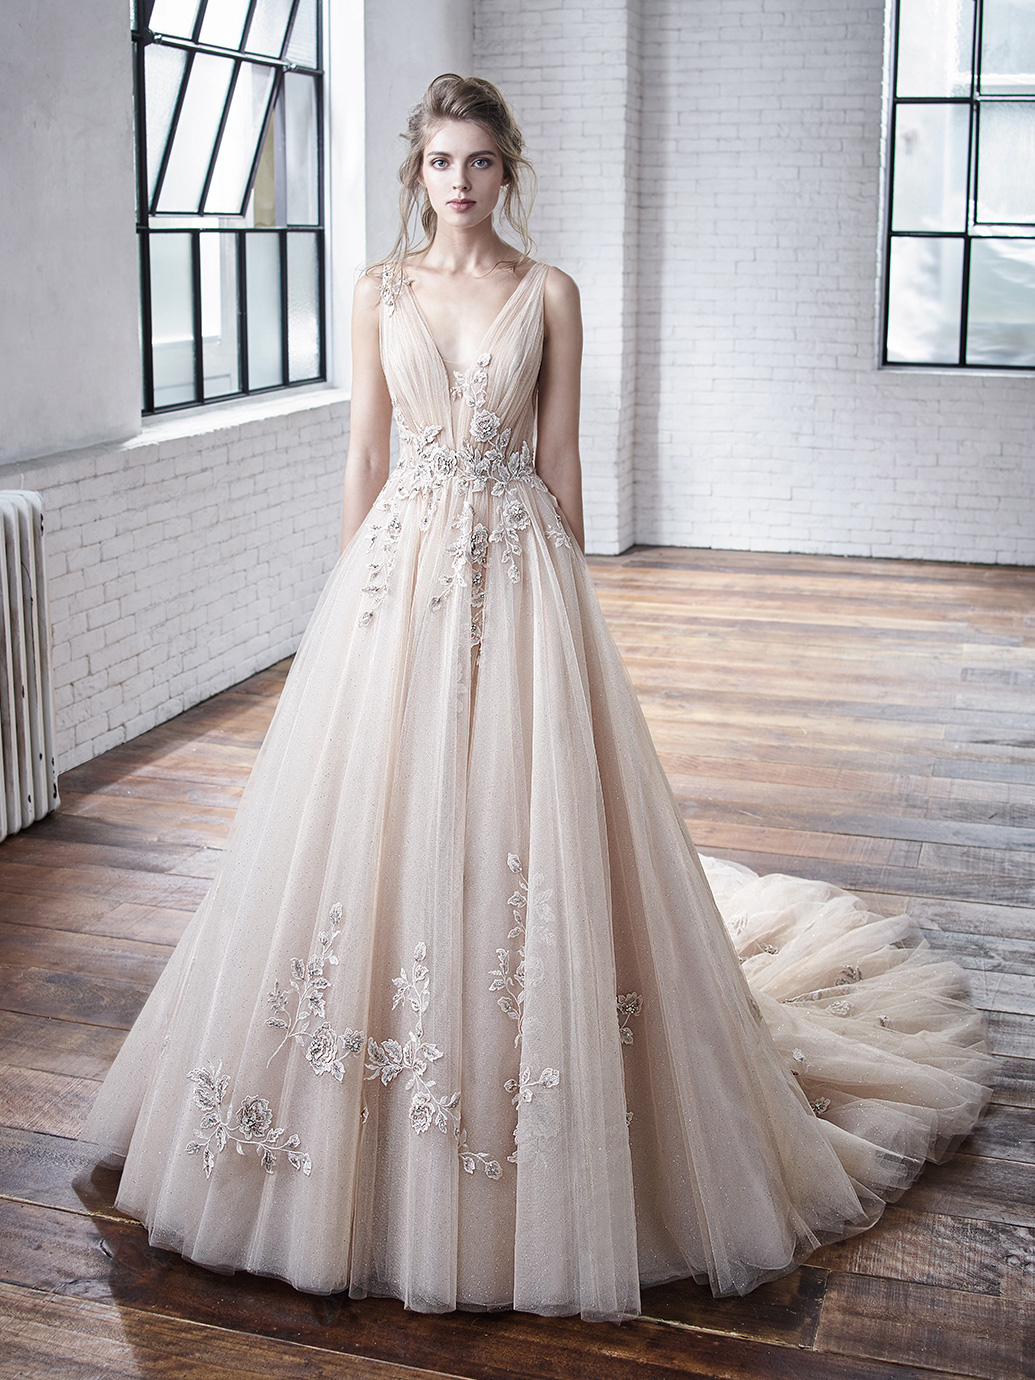 BM_Bride_2019_Pro_Cheryl_Fro_Web.jpg